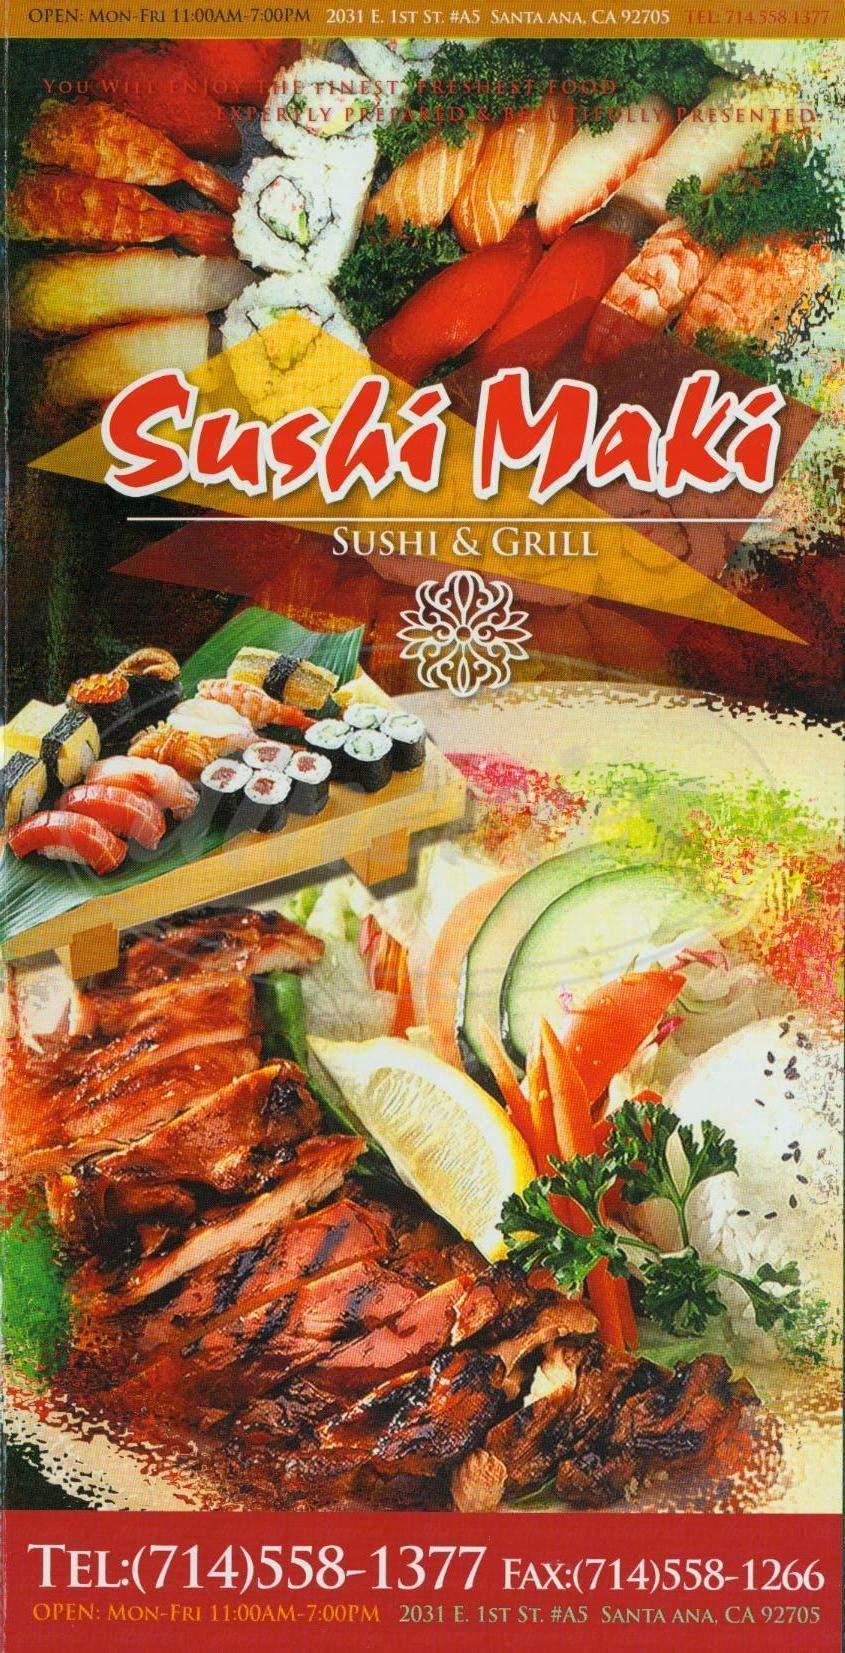 menu for Sushi Maki